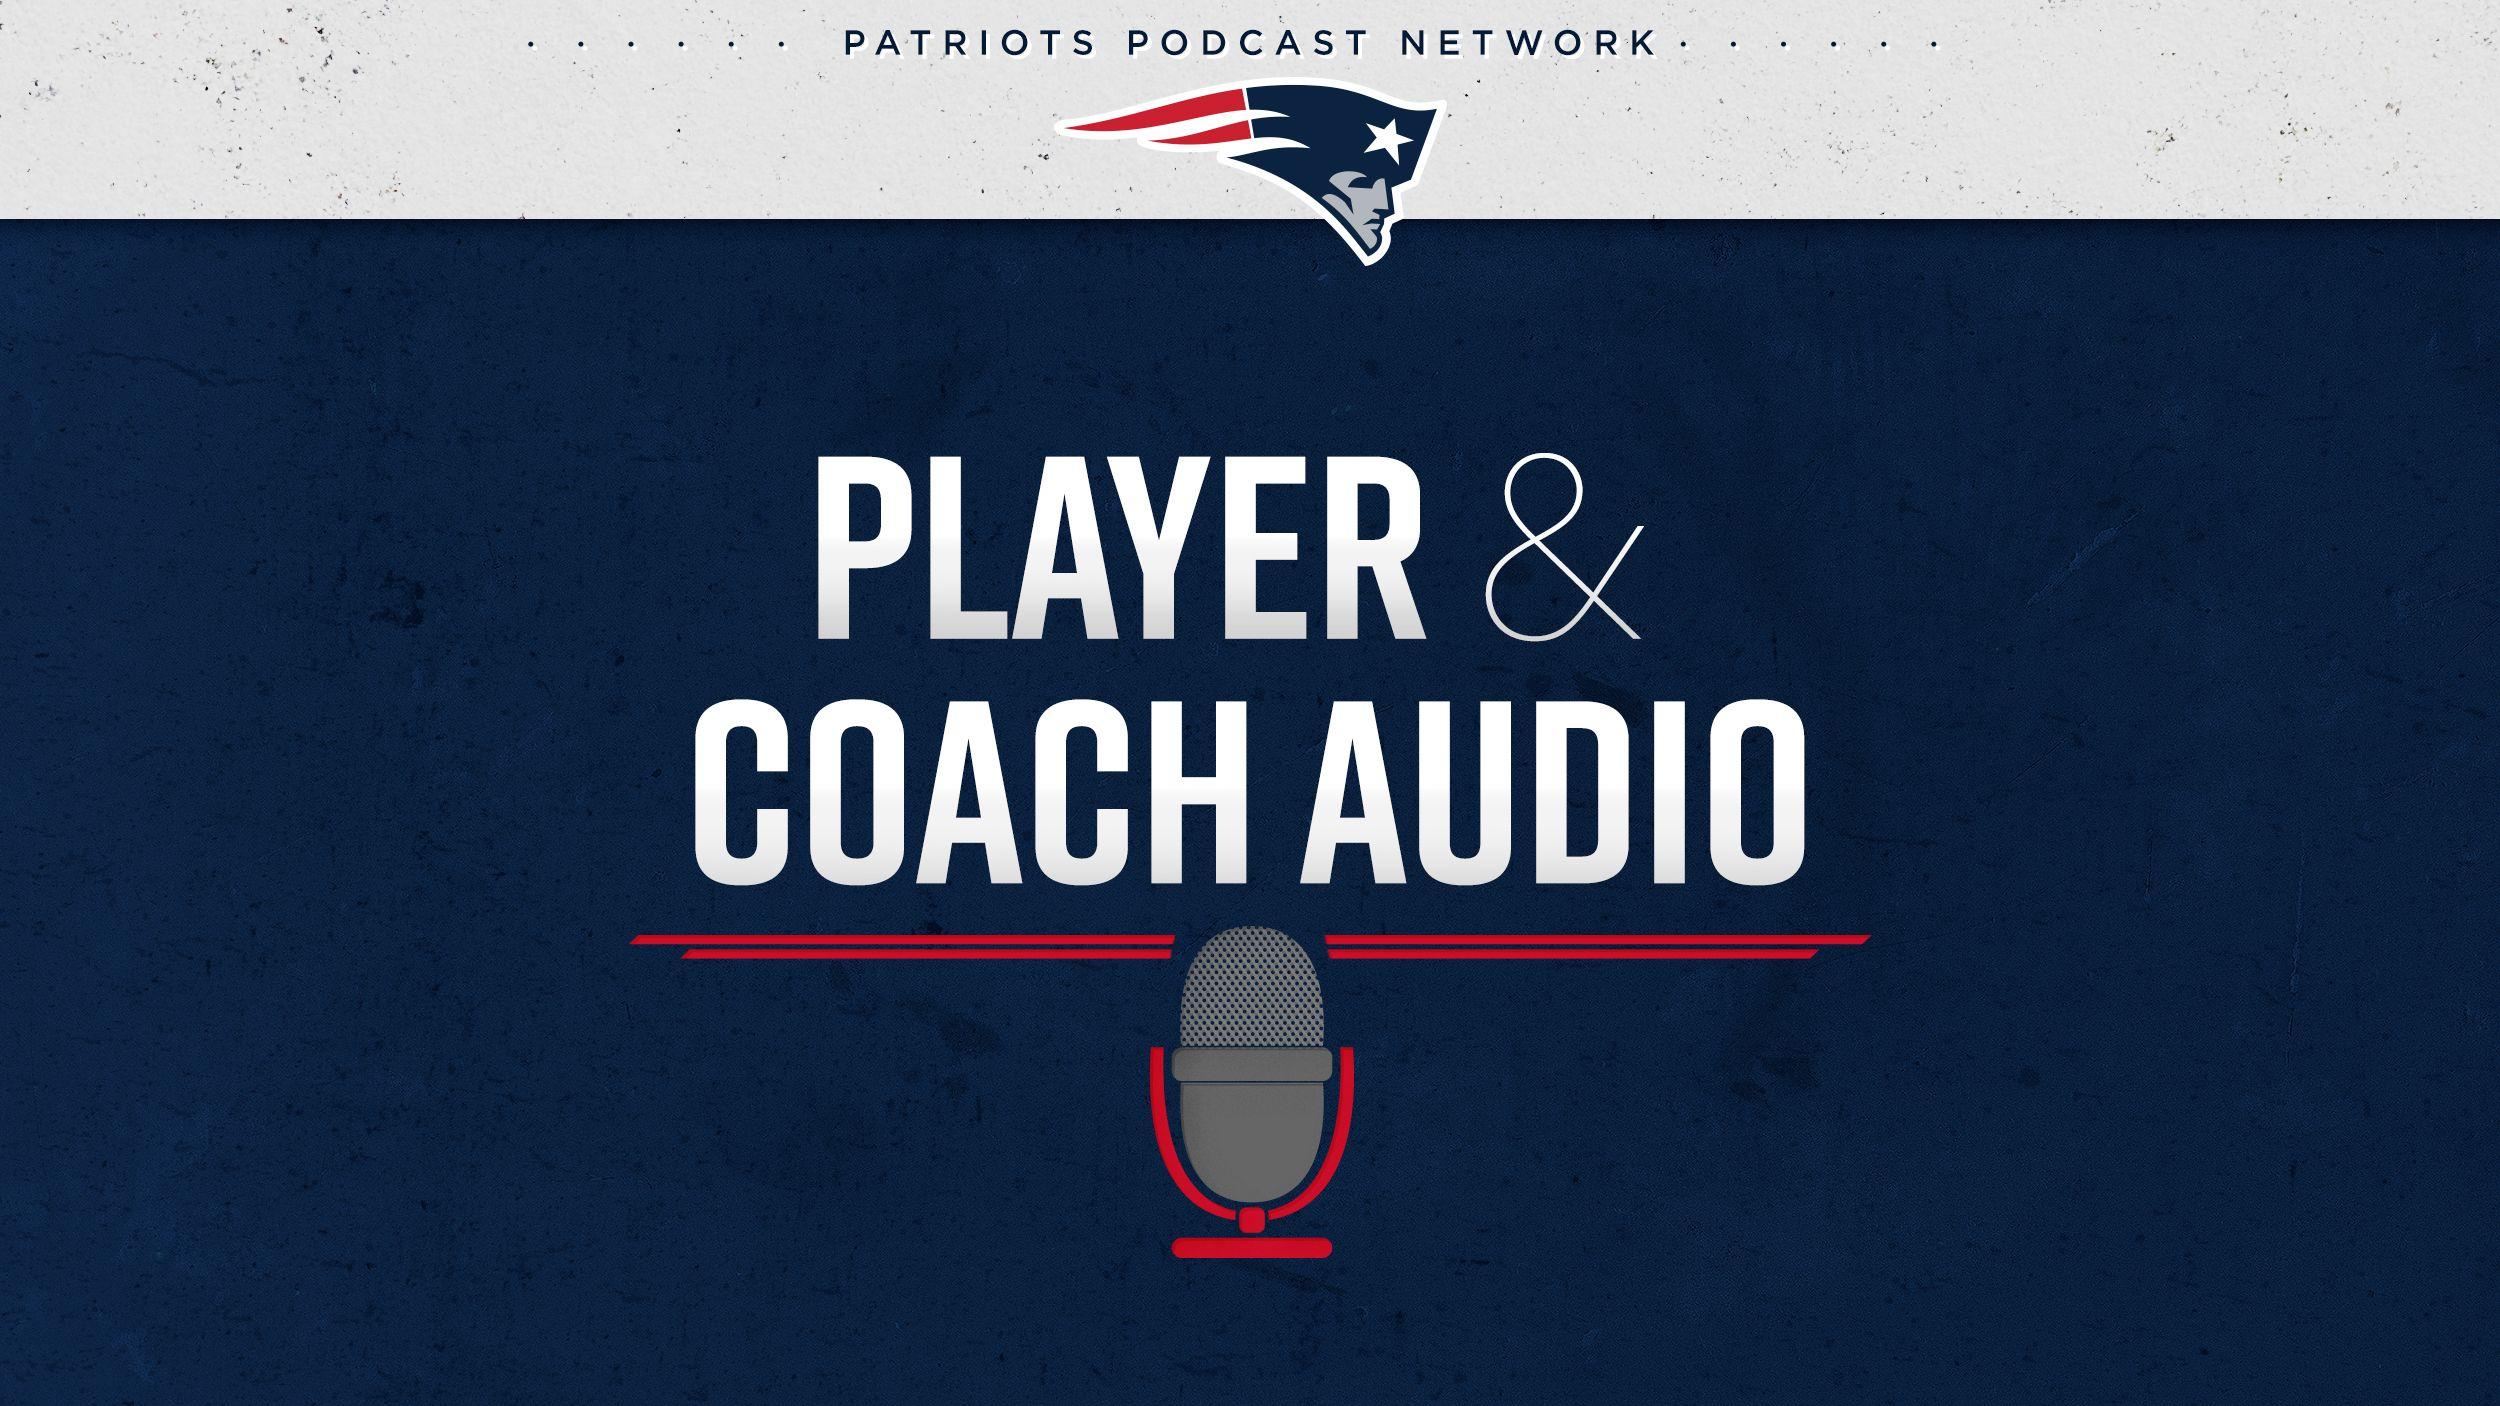 Player & Coach Audio